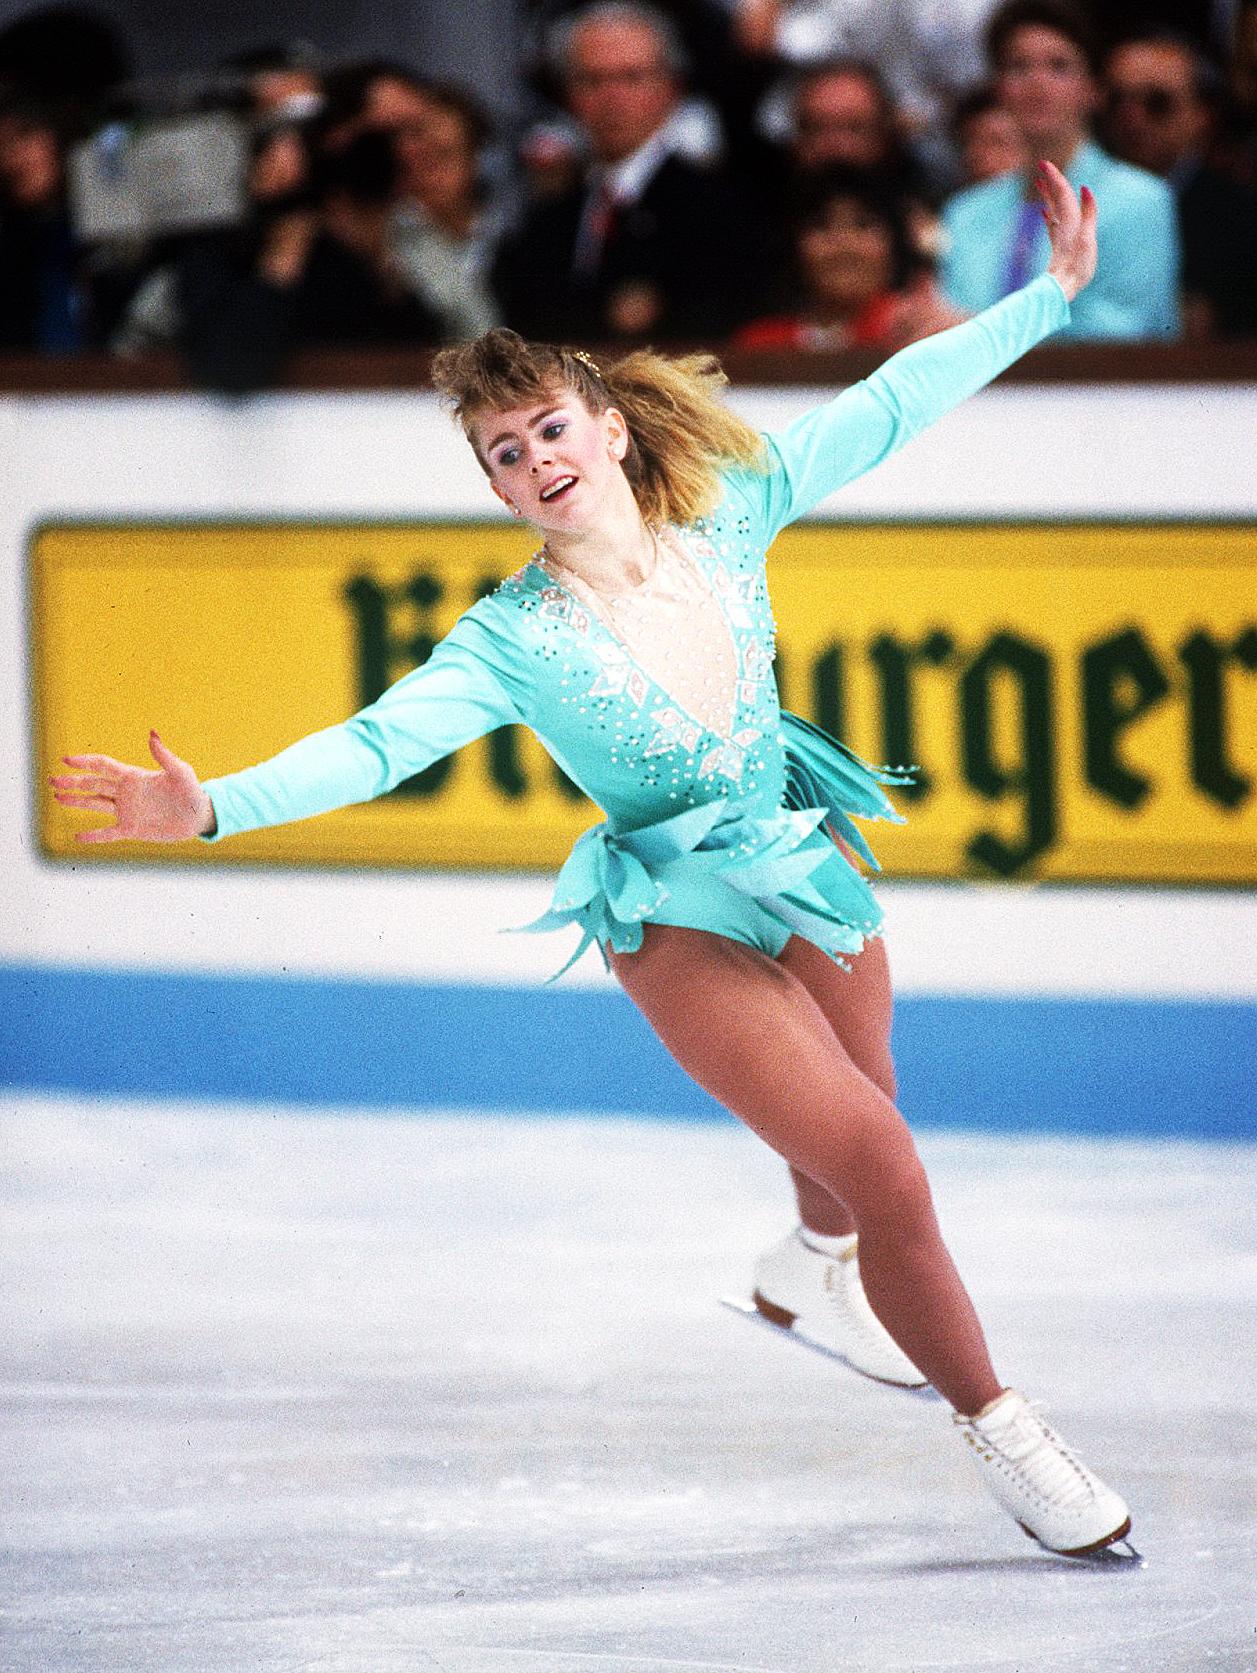 Tonya Harding World Figure Skating Championships 1991 Munich